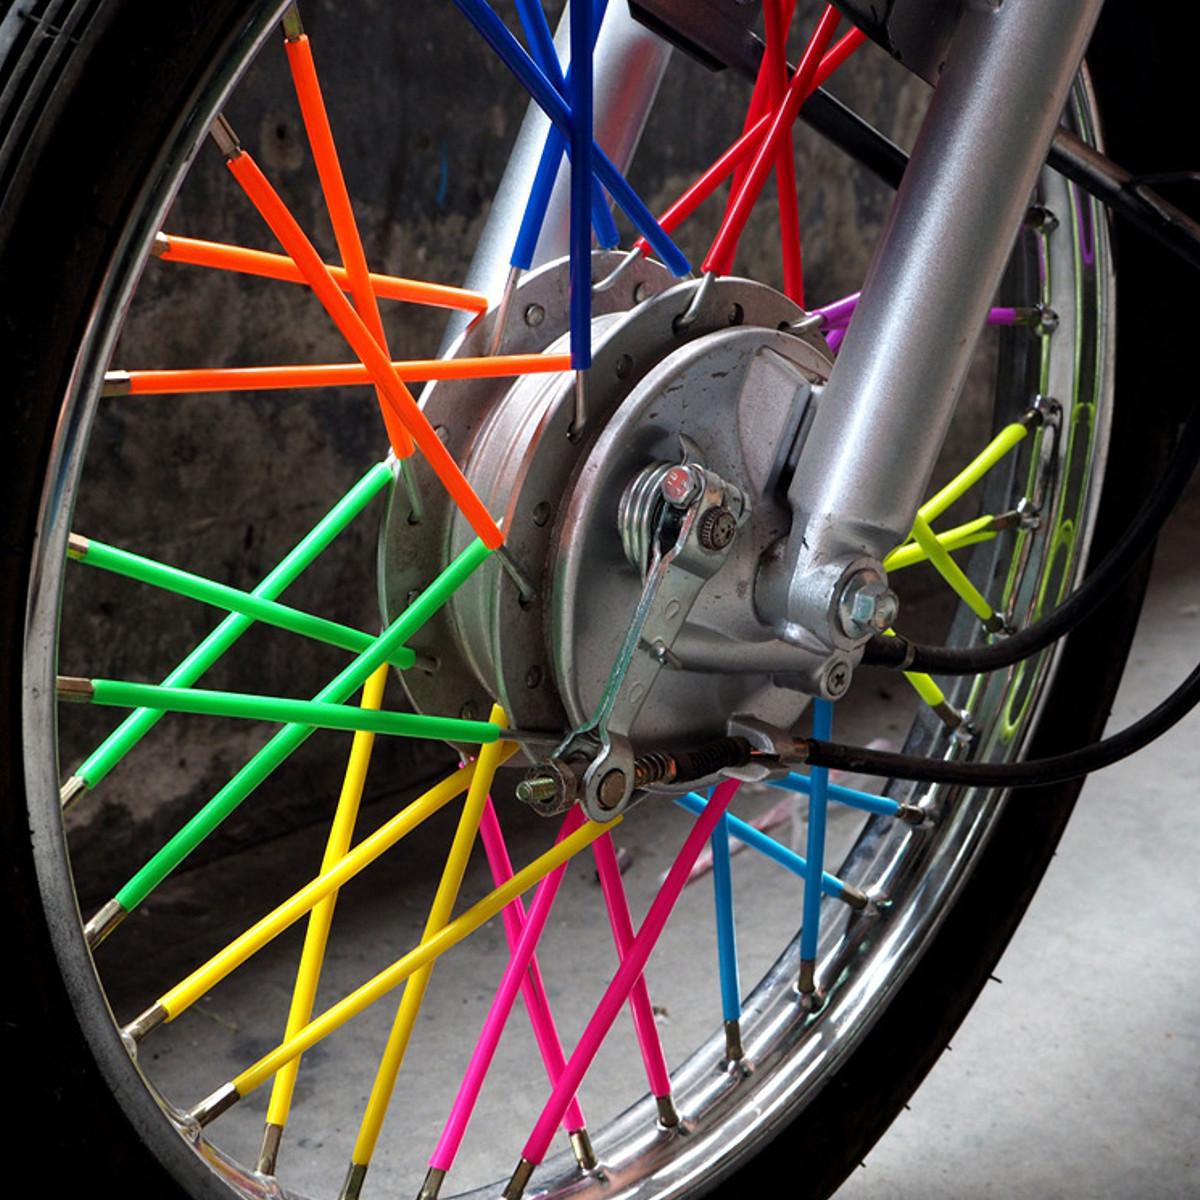 72Pcs Spoke Skins Cover Wheel Rim Guard Protector Wraps For Motocross Motorcycle Dirt Bike